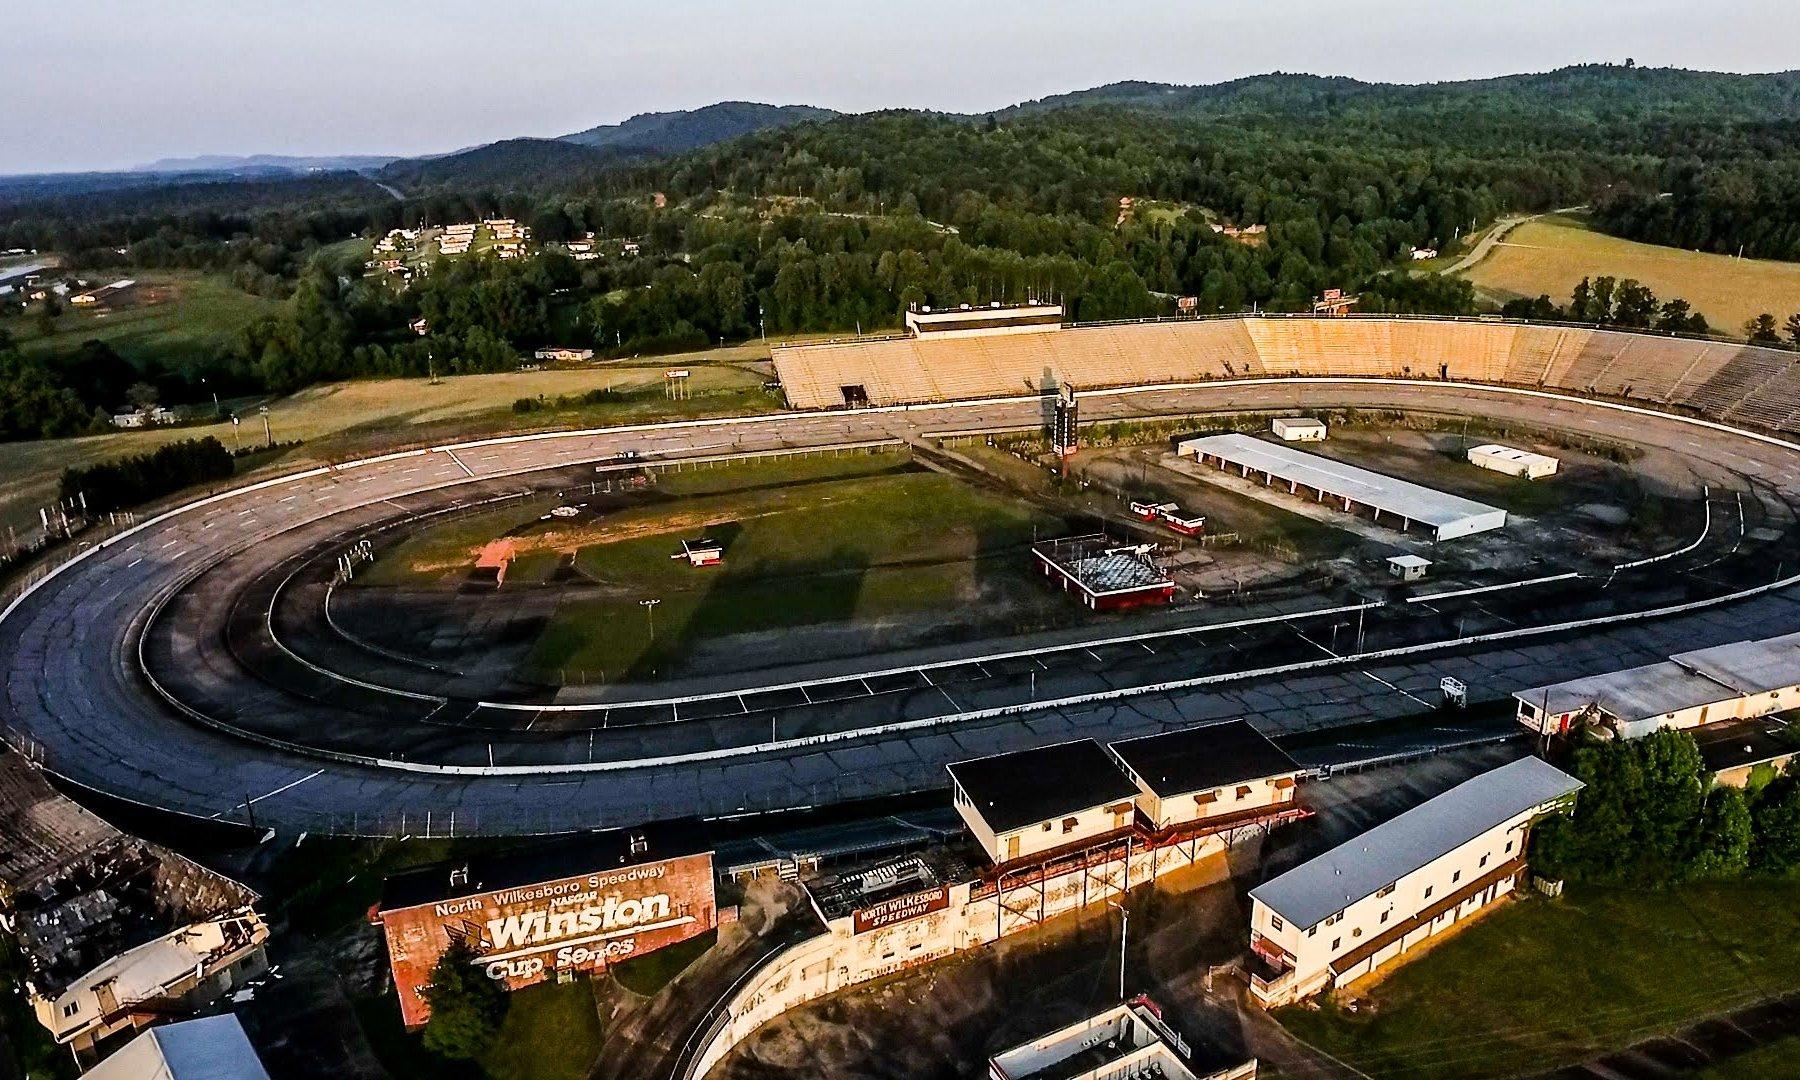 North Wilkesboro Speedway